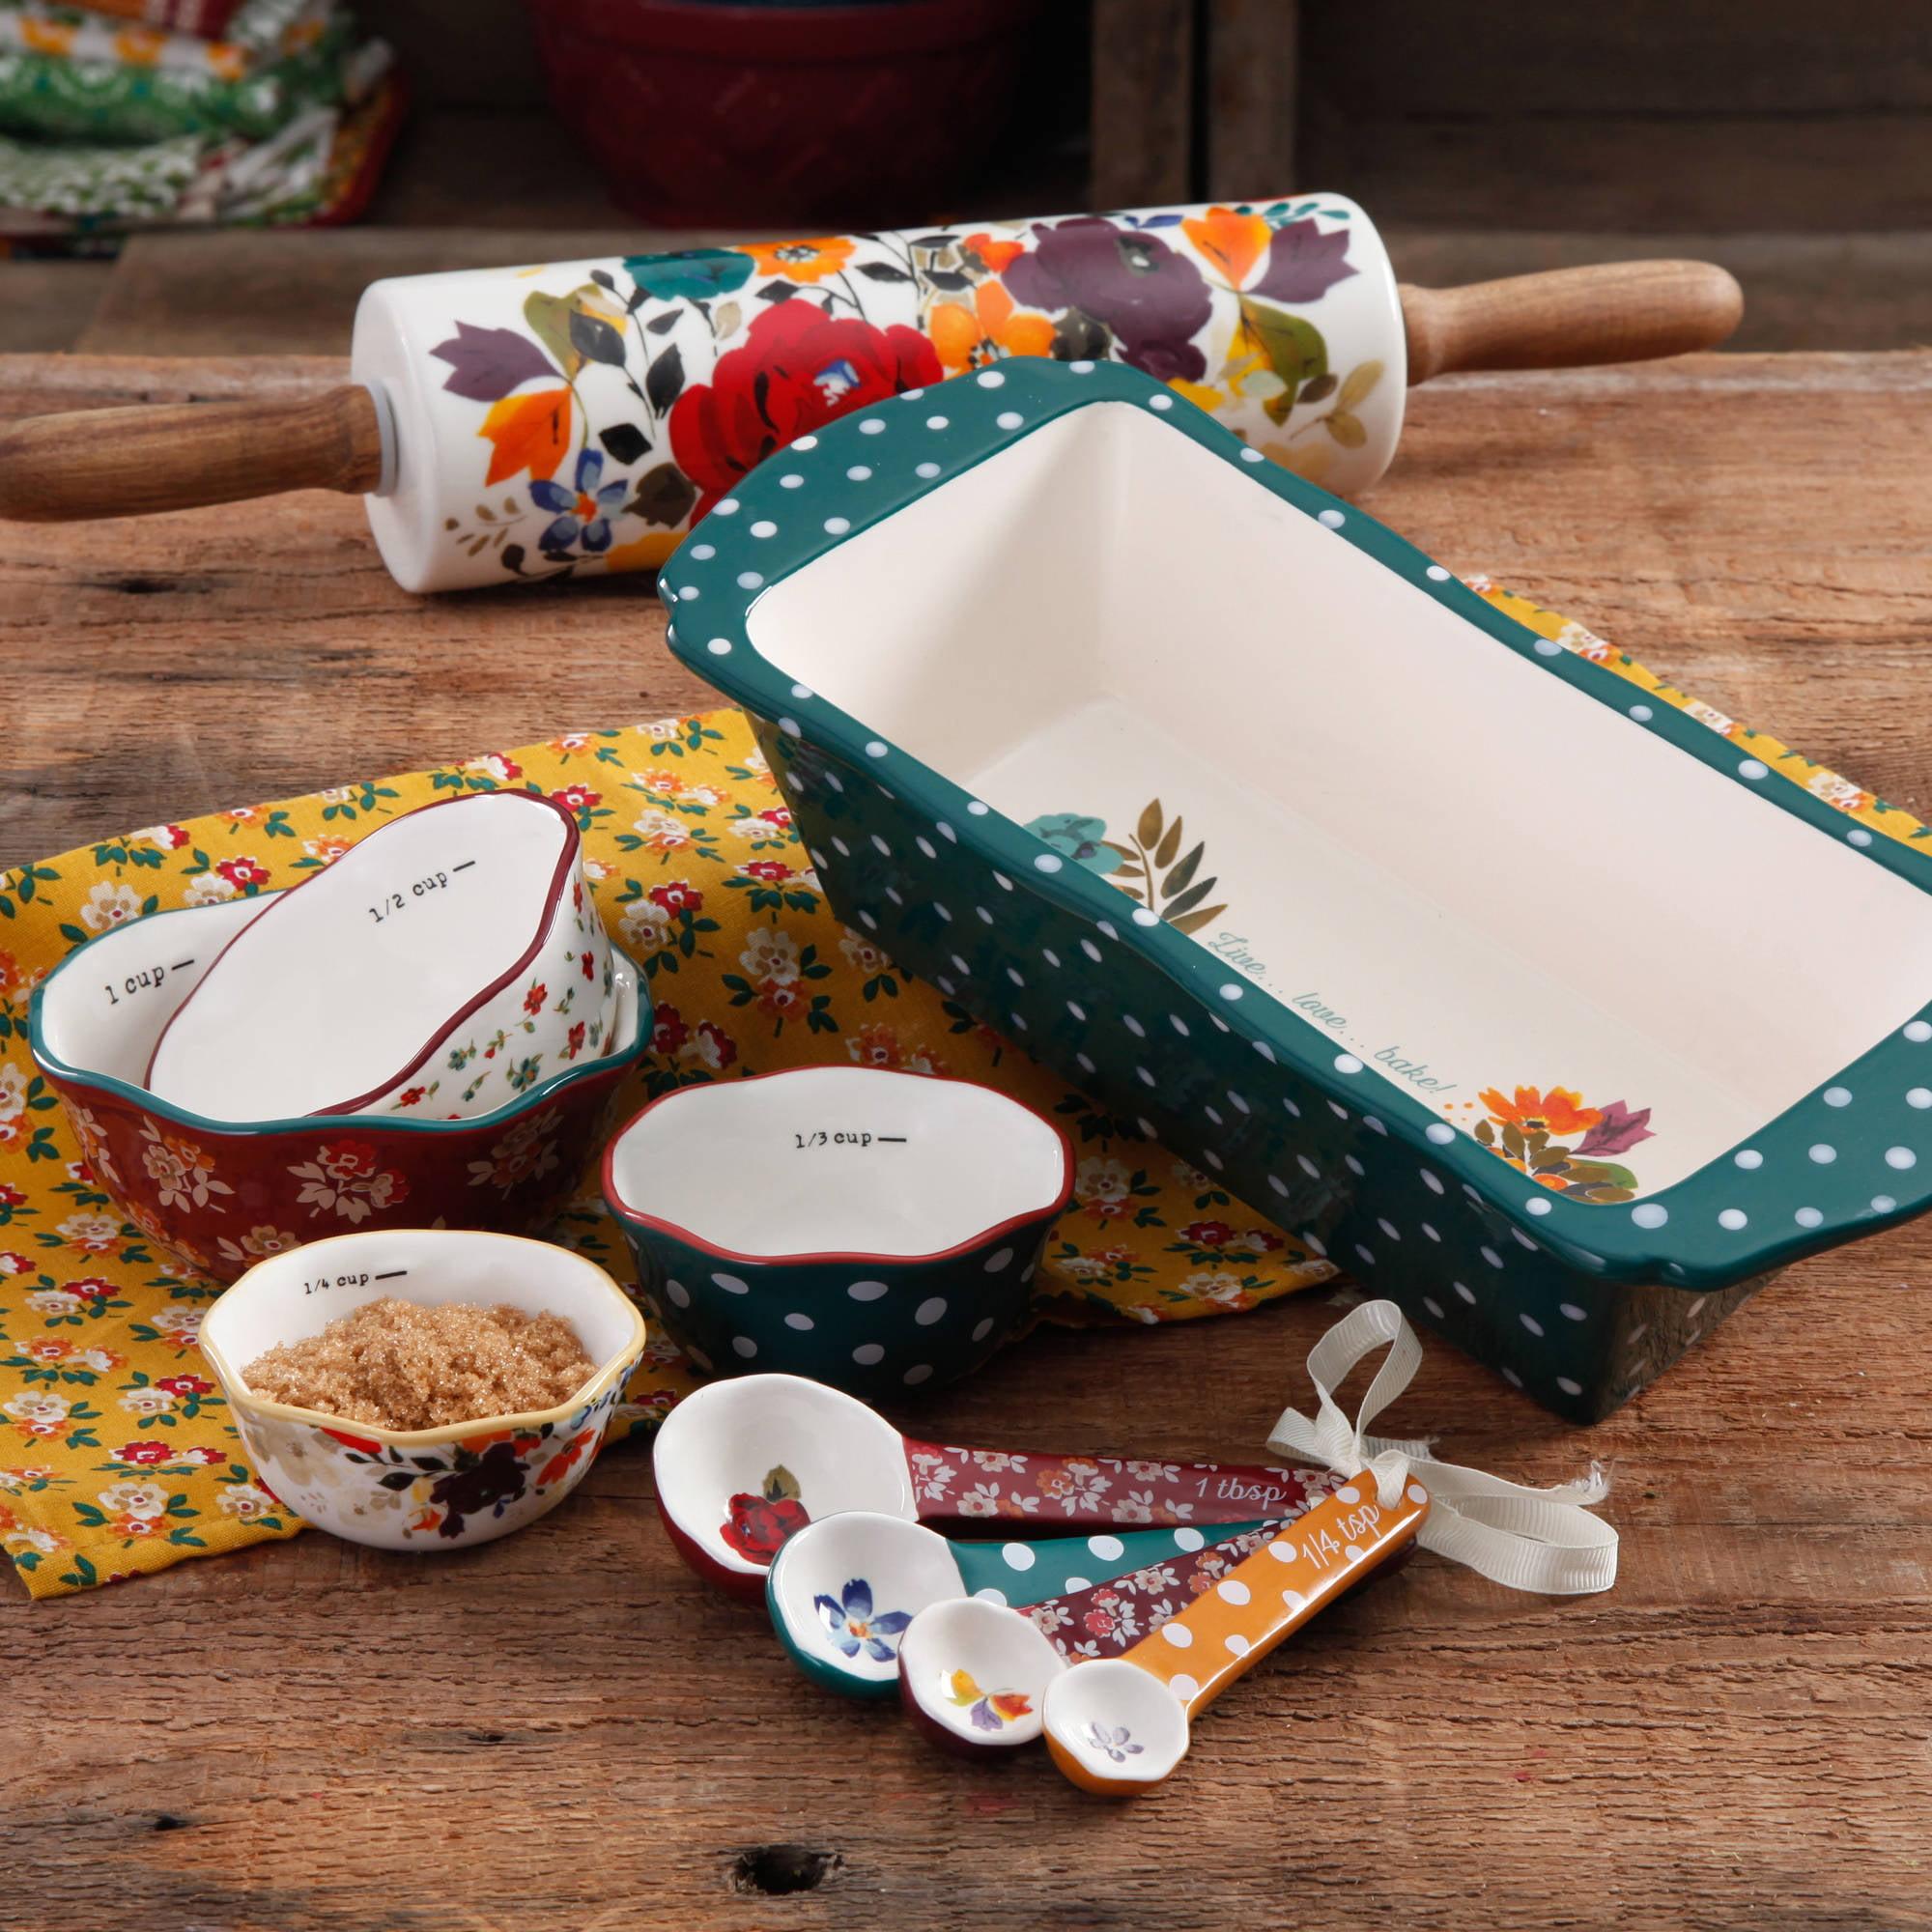 The Pioneer Woman Harvest Bakeware Set 10 Piece Walmart